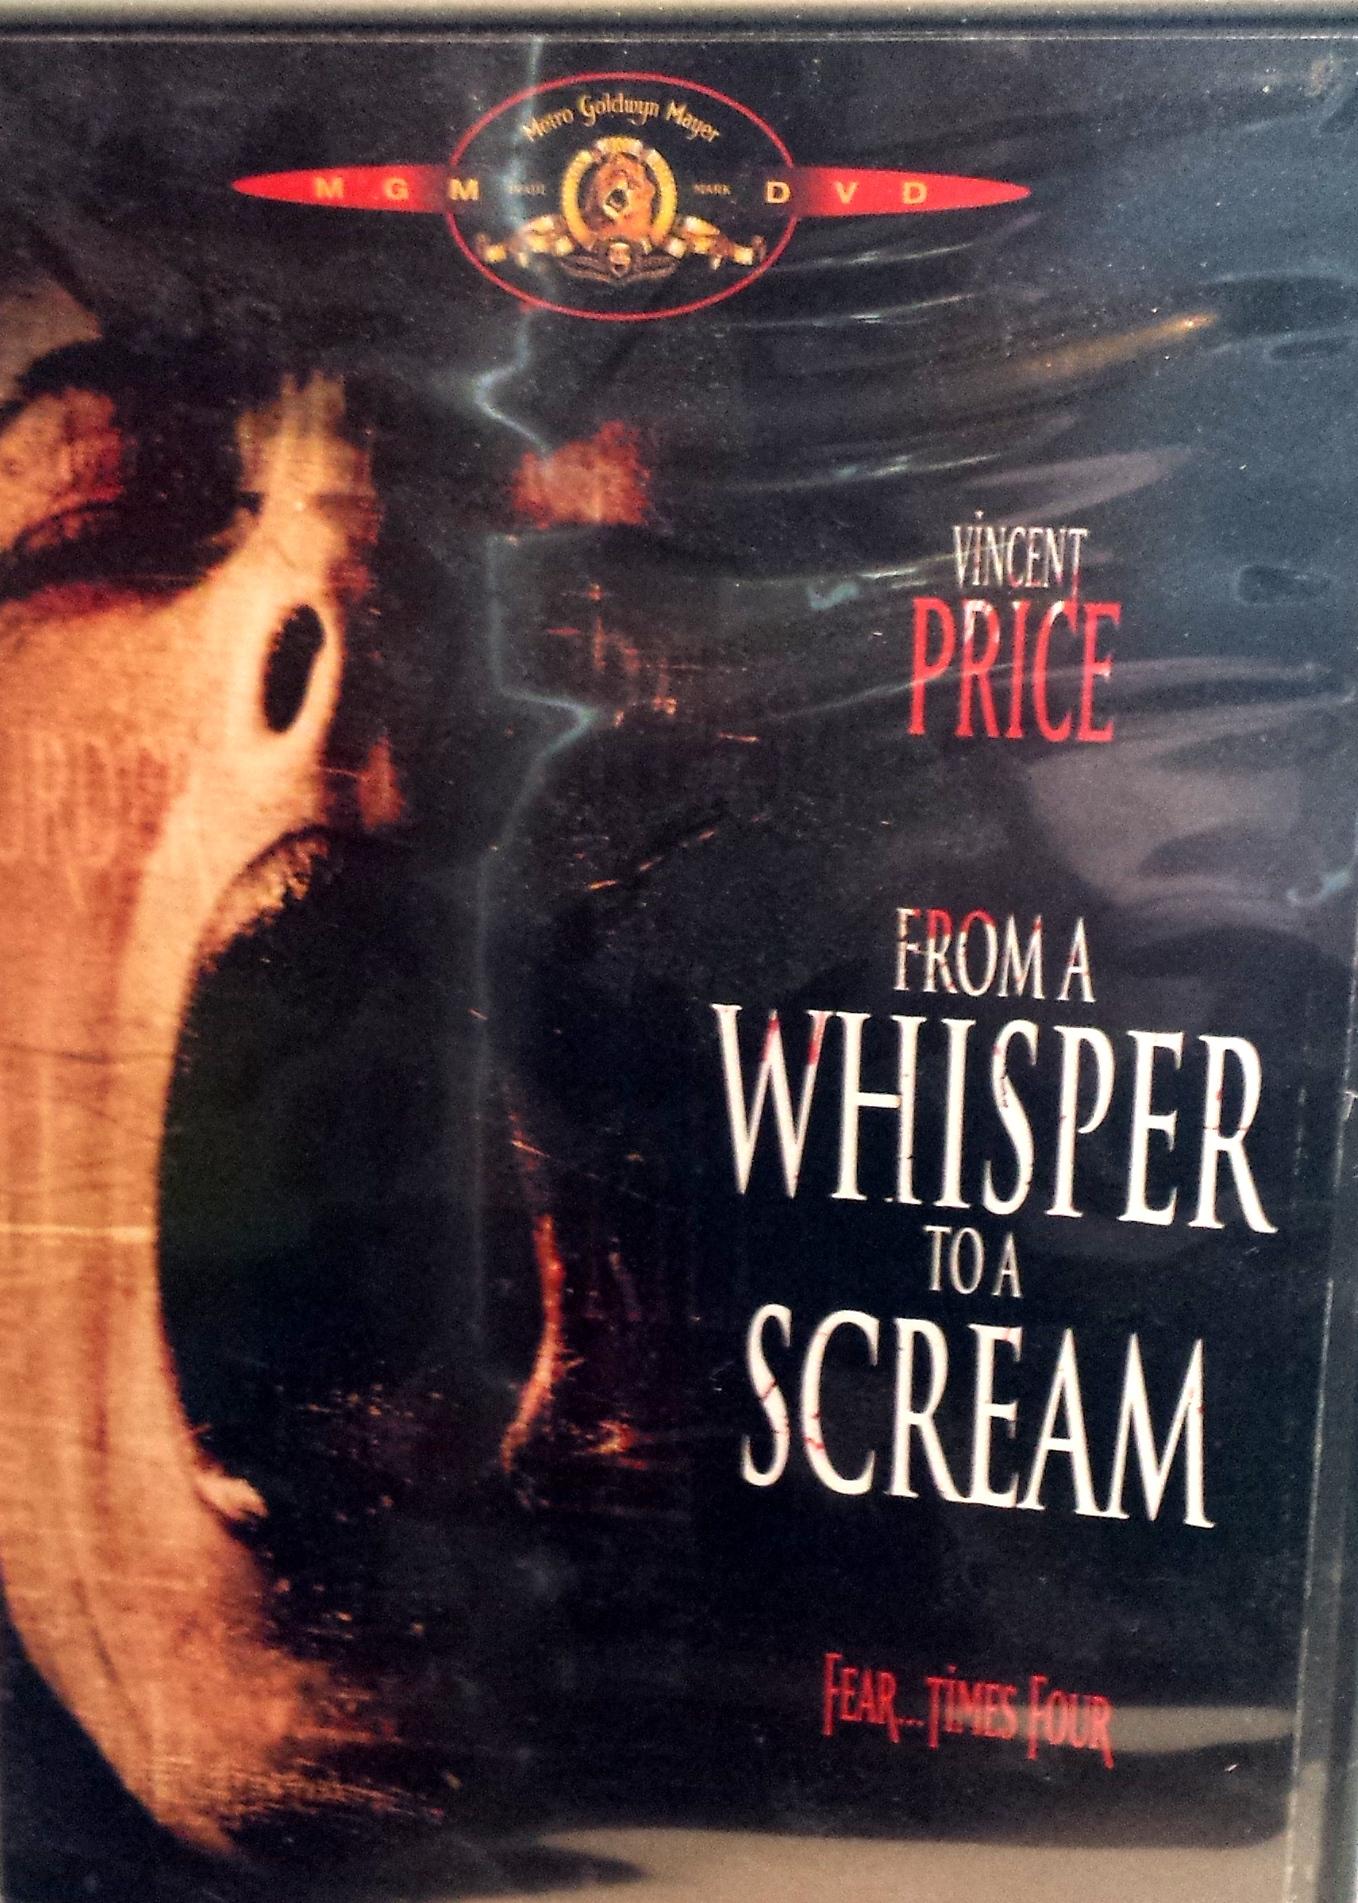 A Whisper To A Scream by Lauren Hammond